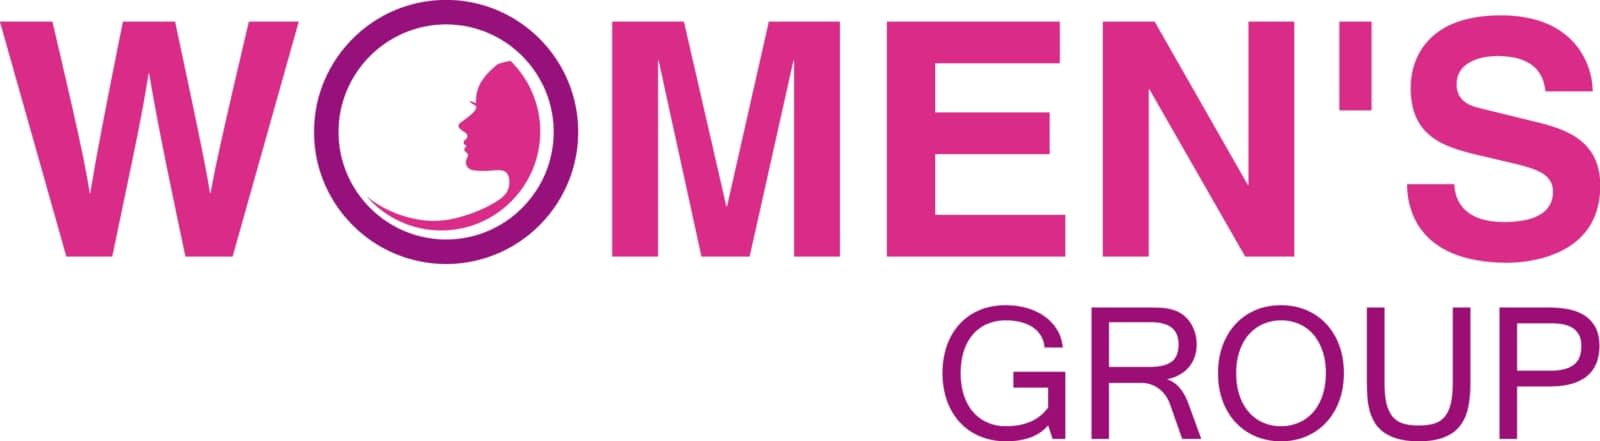 Women's Groupfor Make-Up, Lipstick and Skin Care